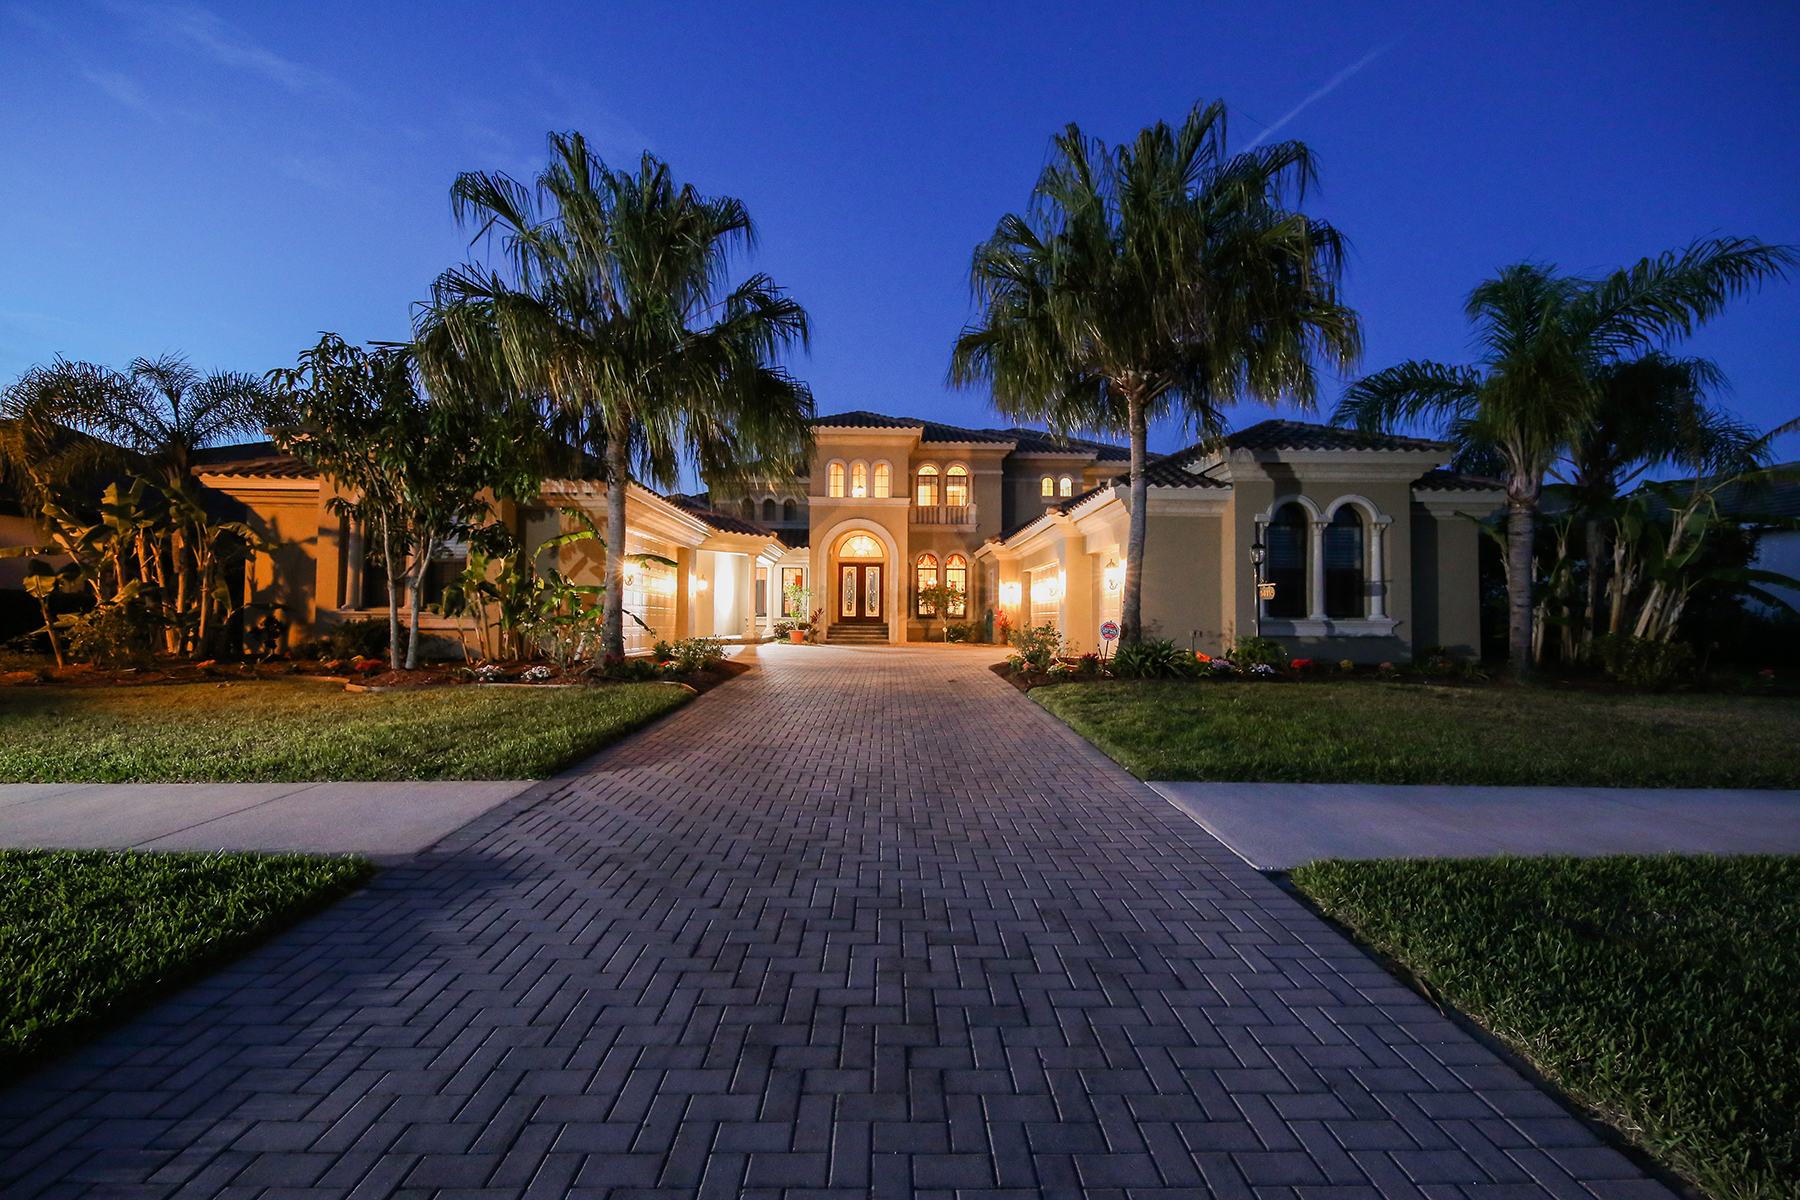 Casa Unifamiliar por un Venta en WINDING RIVER 14115 11th Terr NE Bradenton, Florida, 34212 Estados Unidos